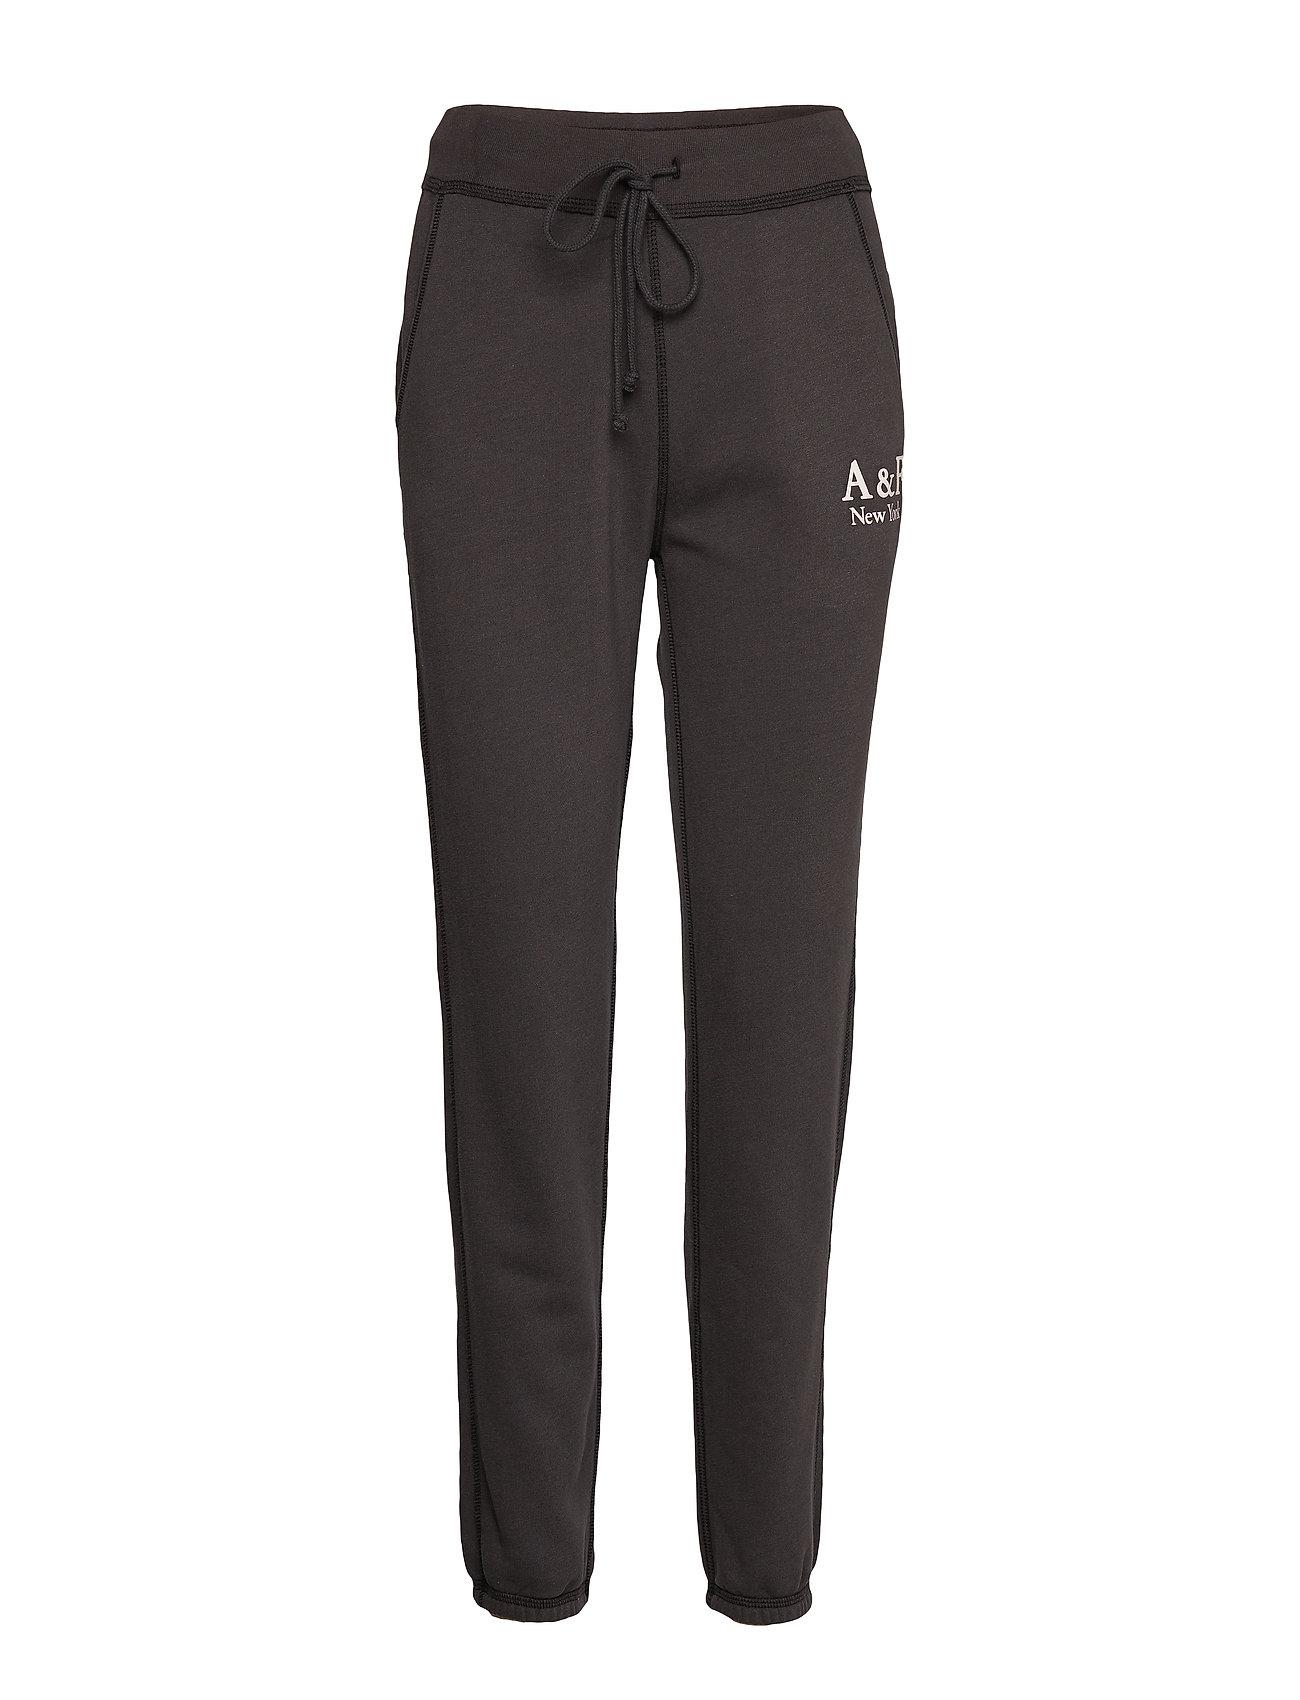 Abercrombie & Fitch Logo Sweatpants - BLACK DD